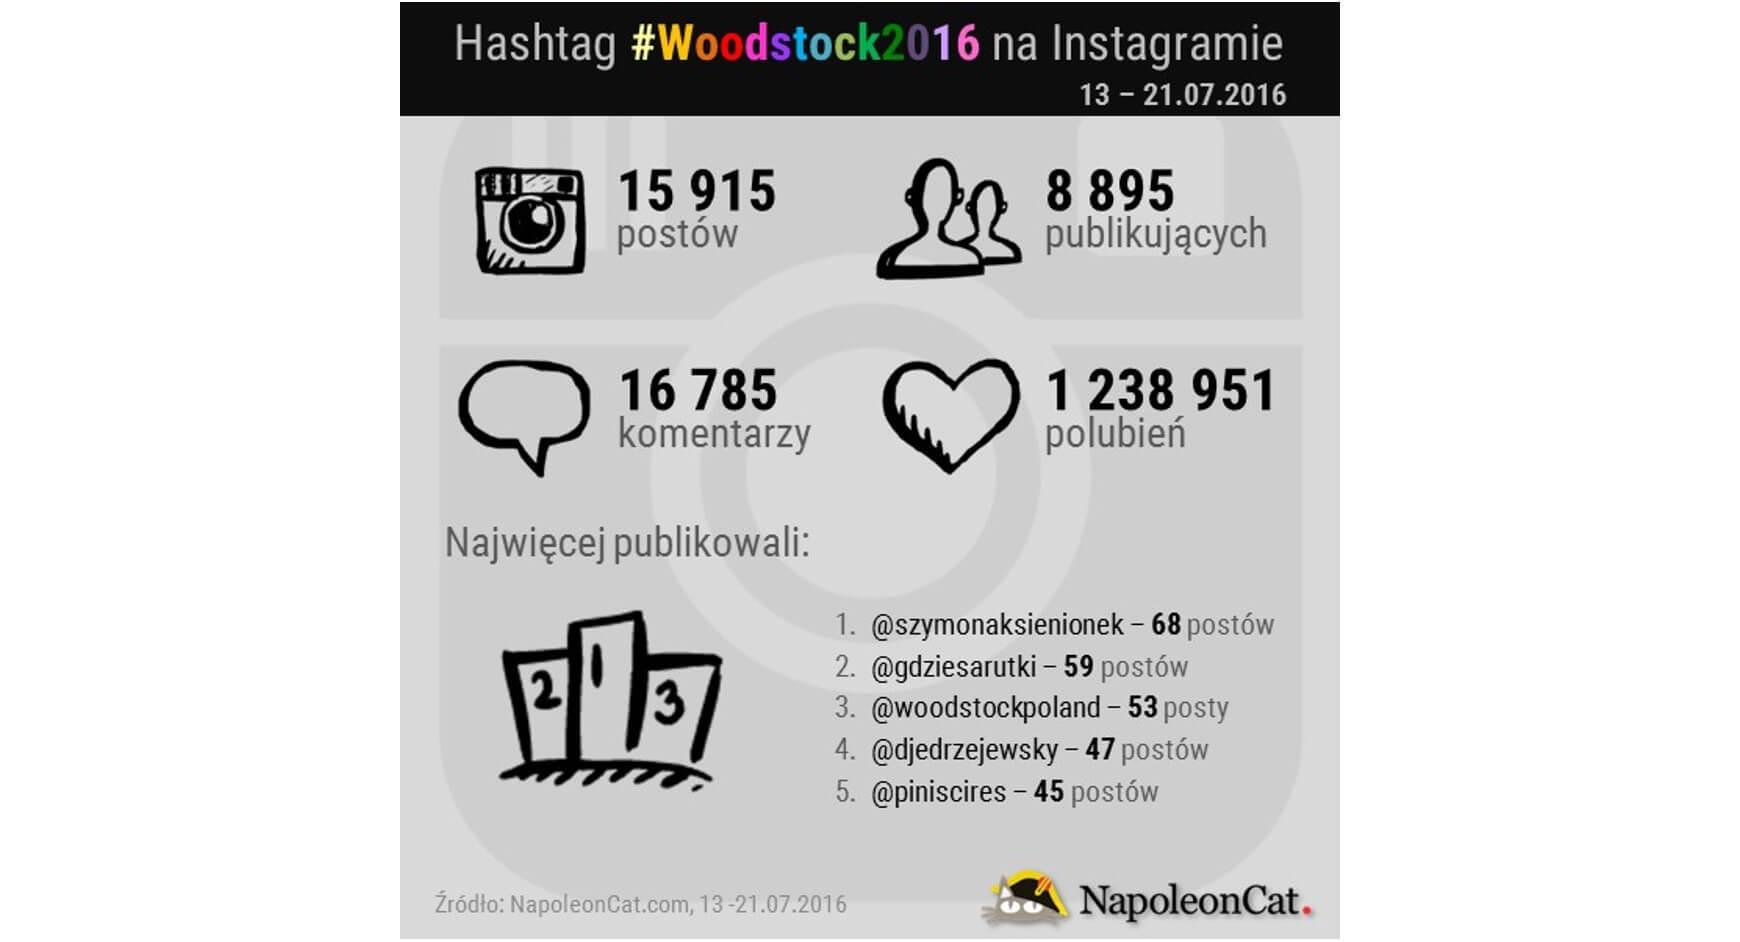 Hashtag Woodstock2016 na Instagramie_13-21.07.2016_NapoleonCat.com blog